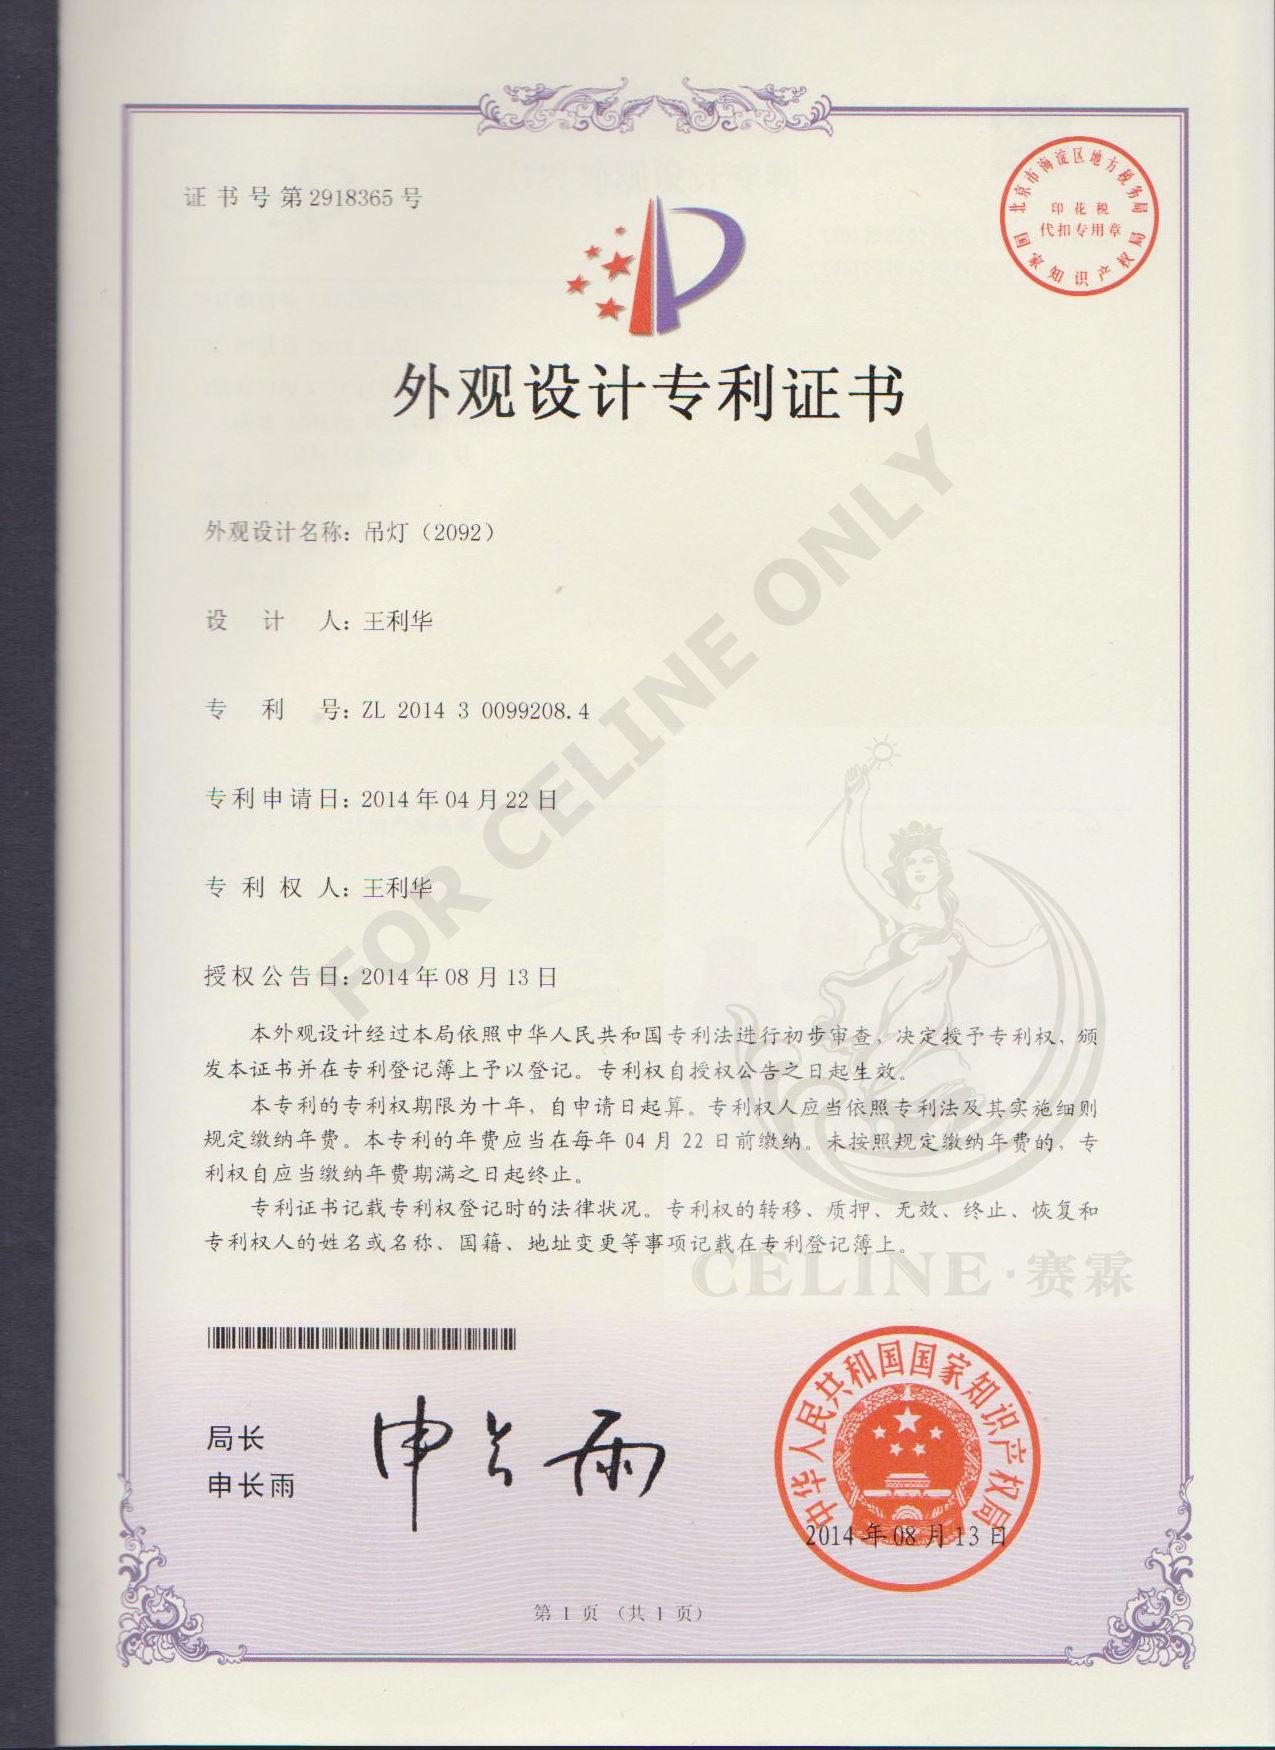 chandelier 2092 serie design patent